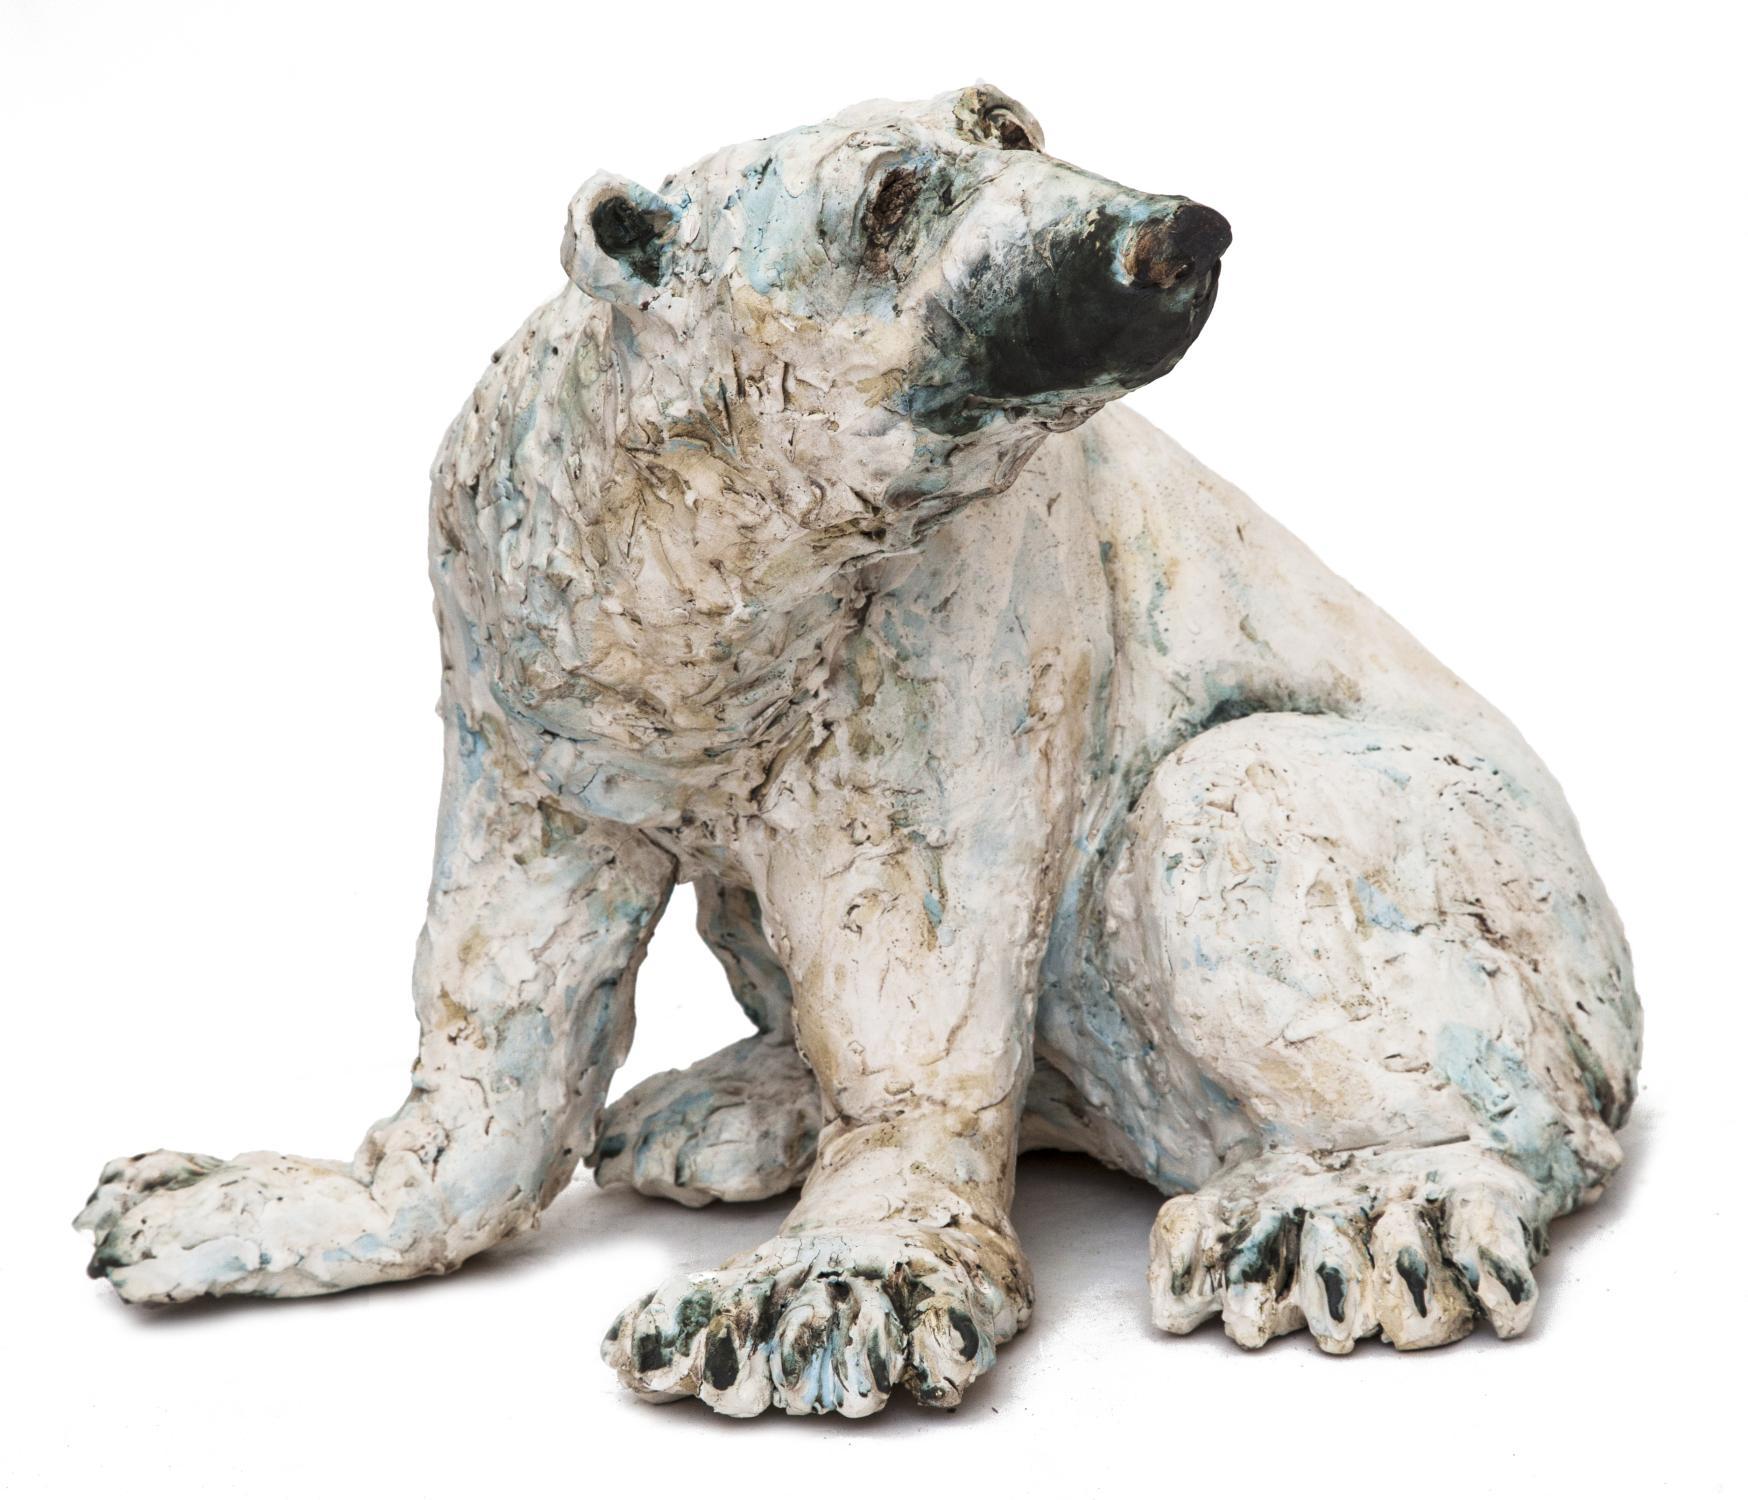 Lot 21 - Sculpture: Christine Cummings, Polar Bear, Stoneware ceramic sculpture, Unique, 33cm high by 40cm